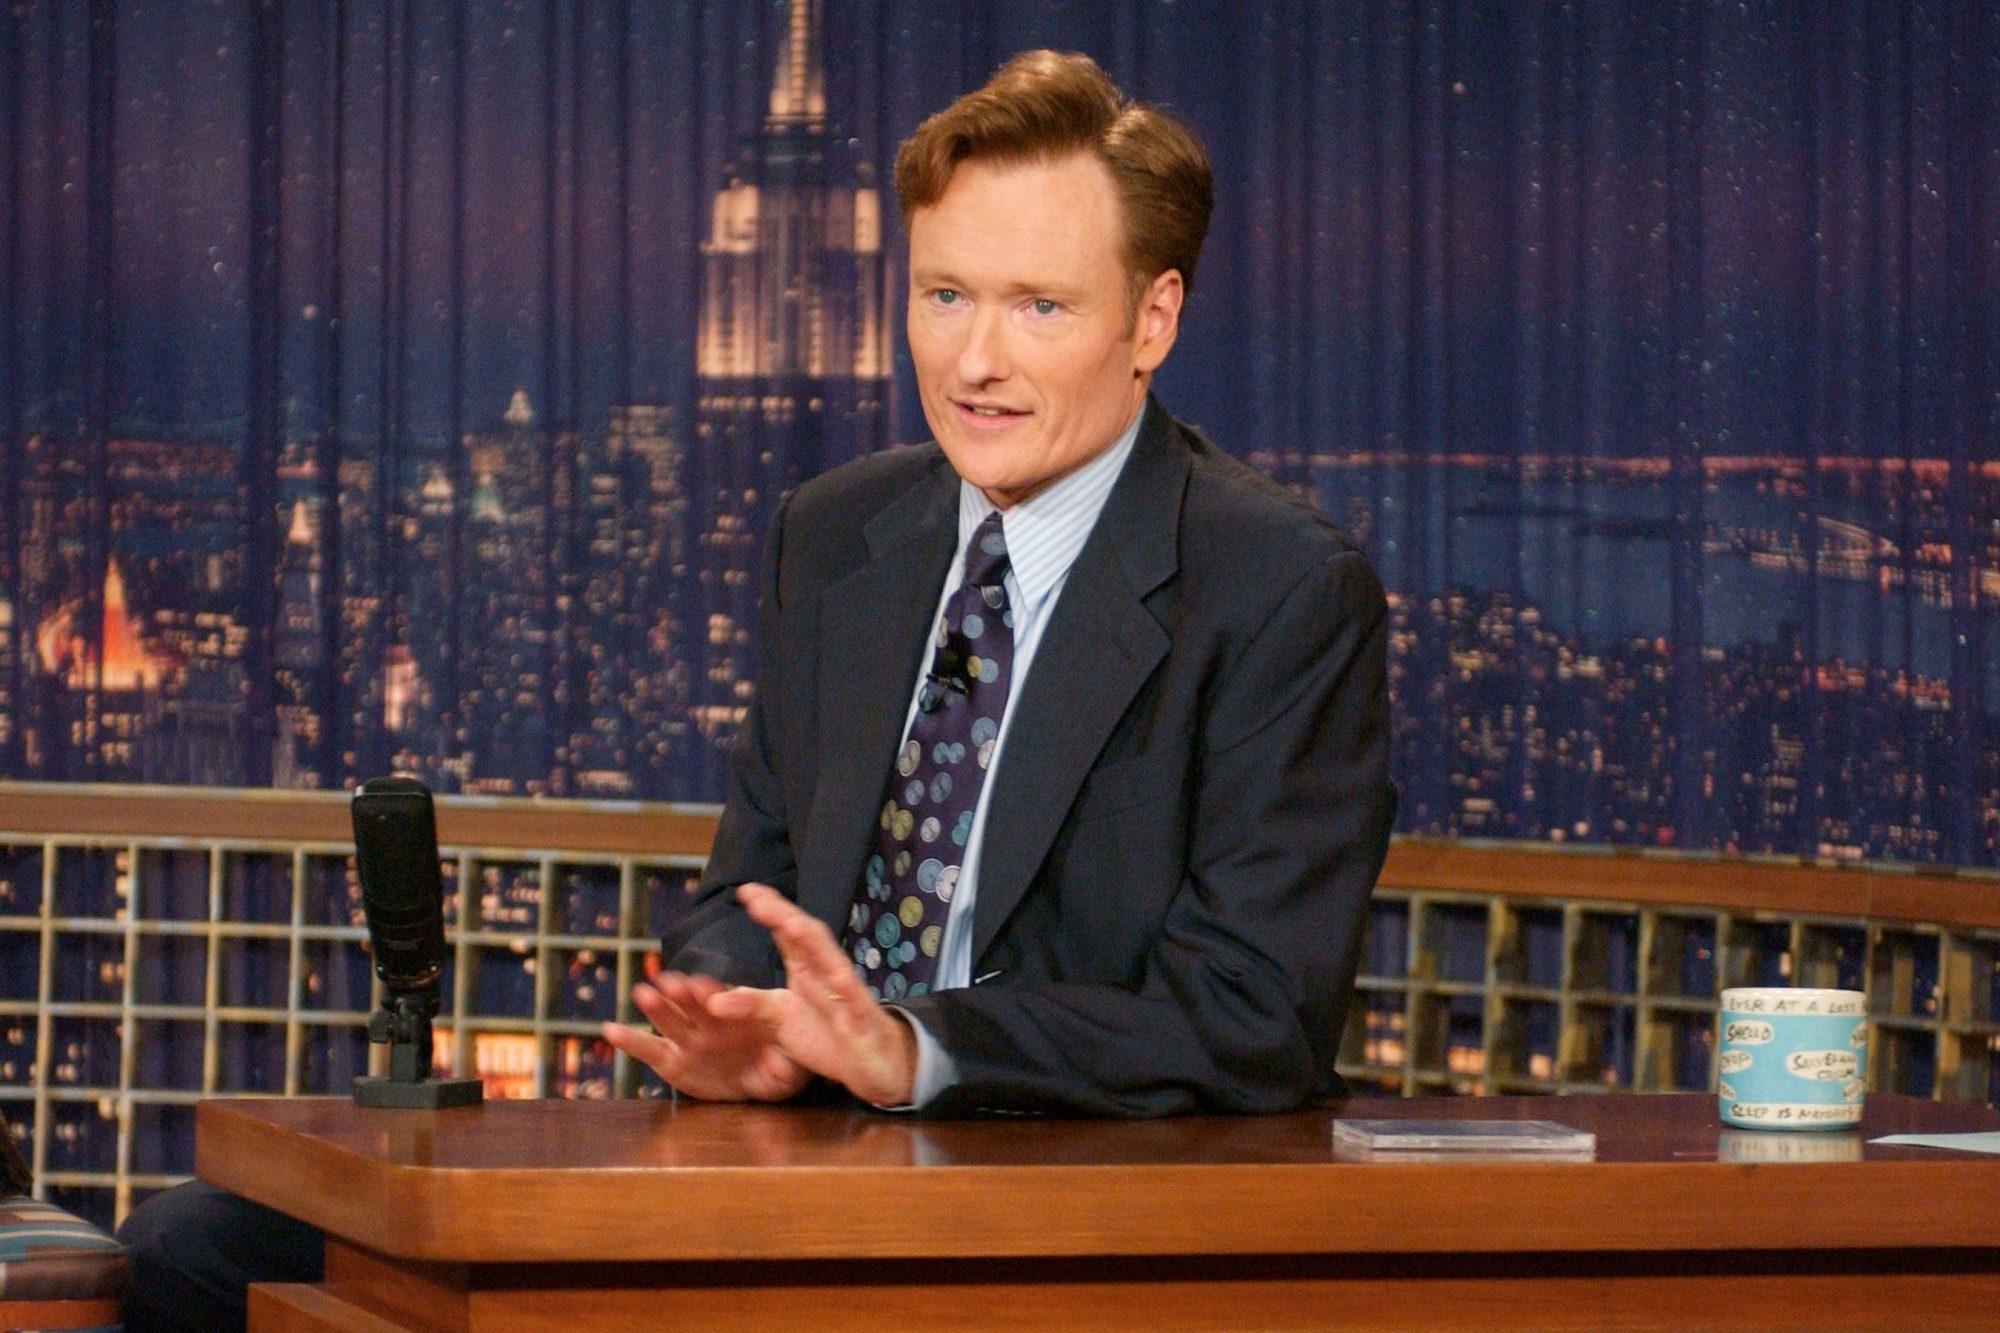 LATE NIGHT WITH CONAN O'BRIEN Conan O'Brien